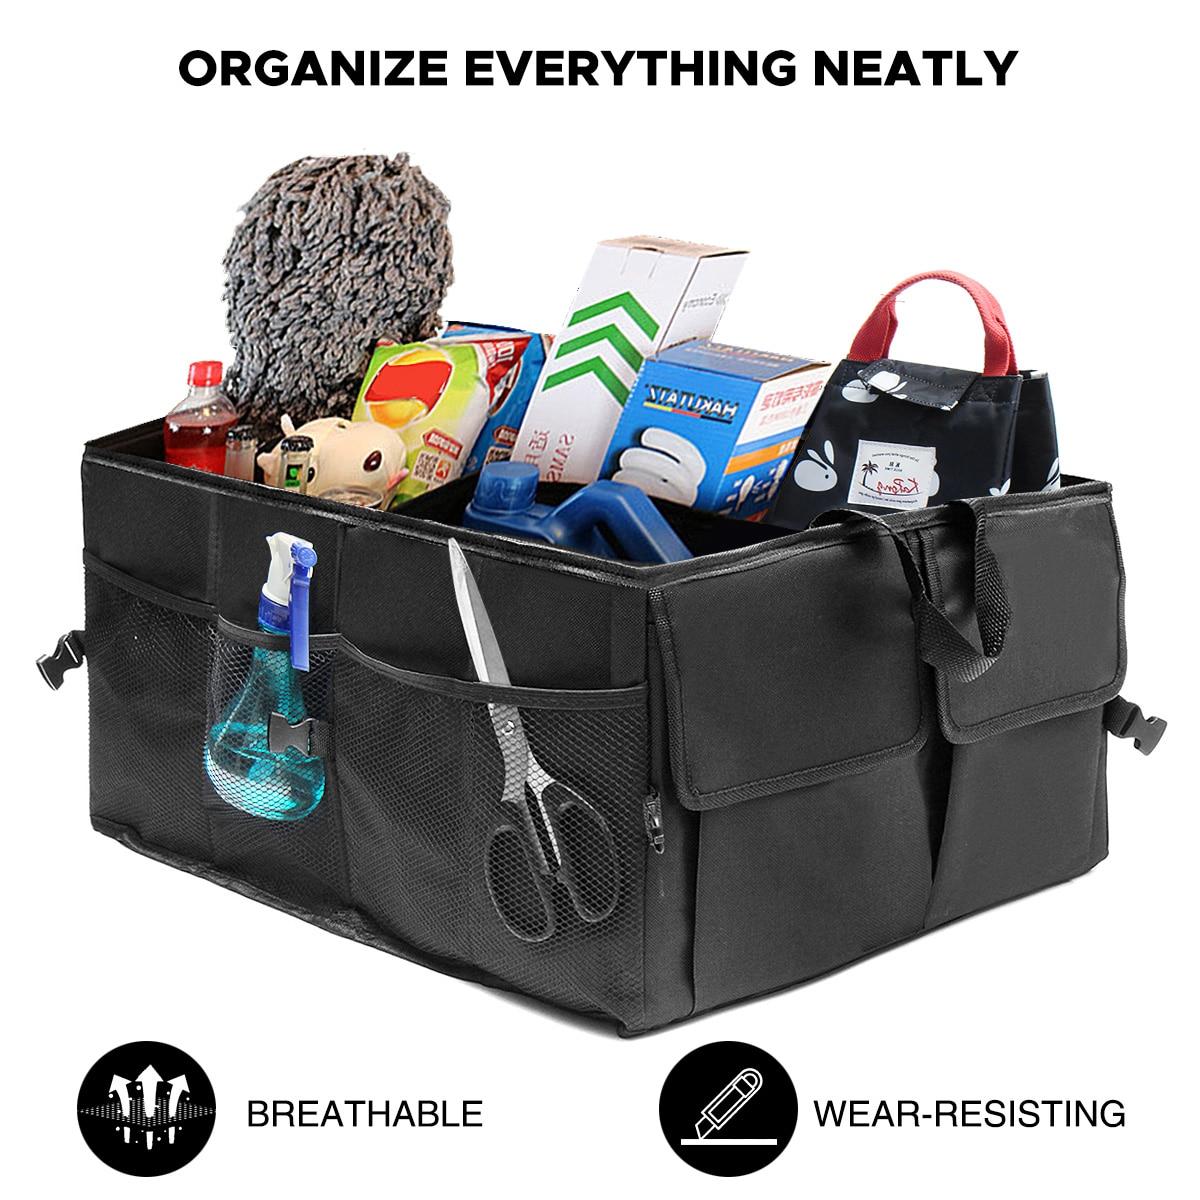 Black Foldable Car Auto Back Rear Trunk Seat Big Storage Bag Pockets Organizer Portable Car Large Capacity Storage Box